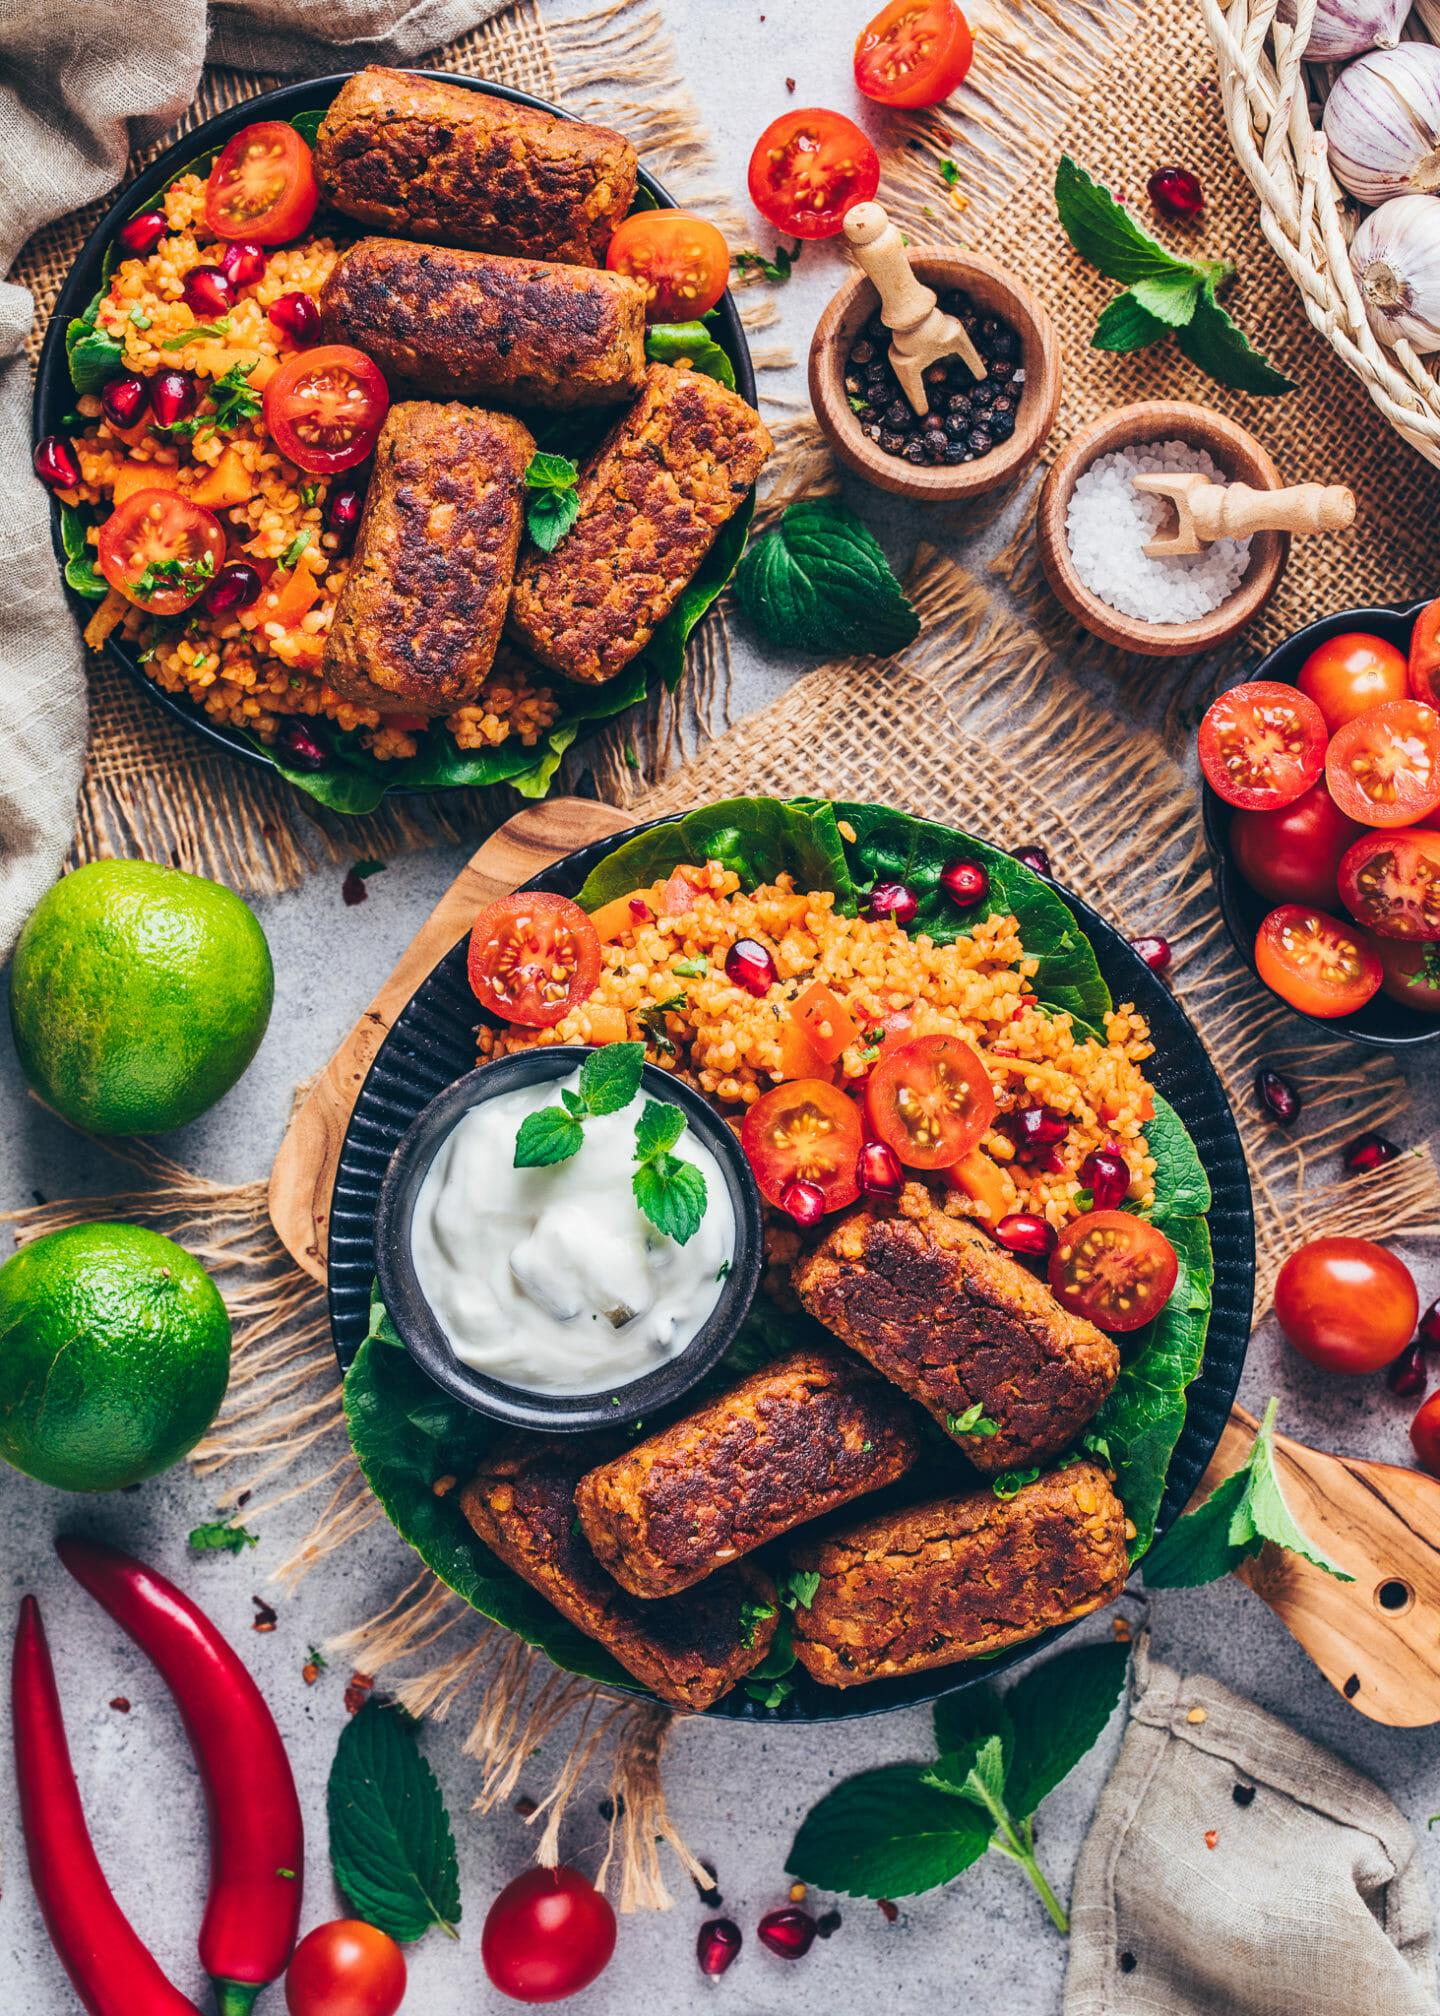 Vegan Cevapcici with Bulgur Salad and Tomatoes